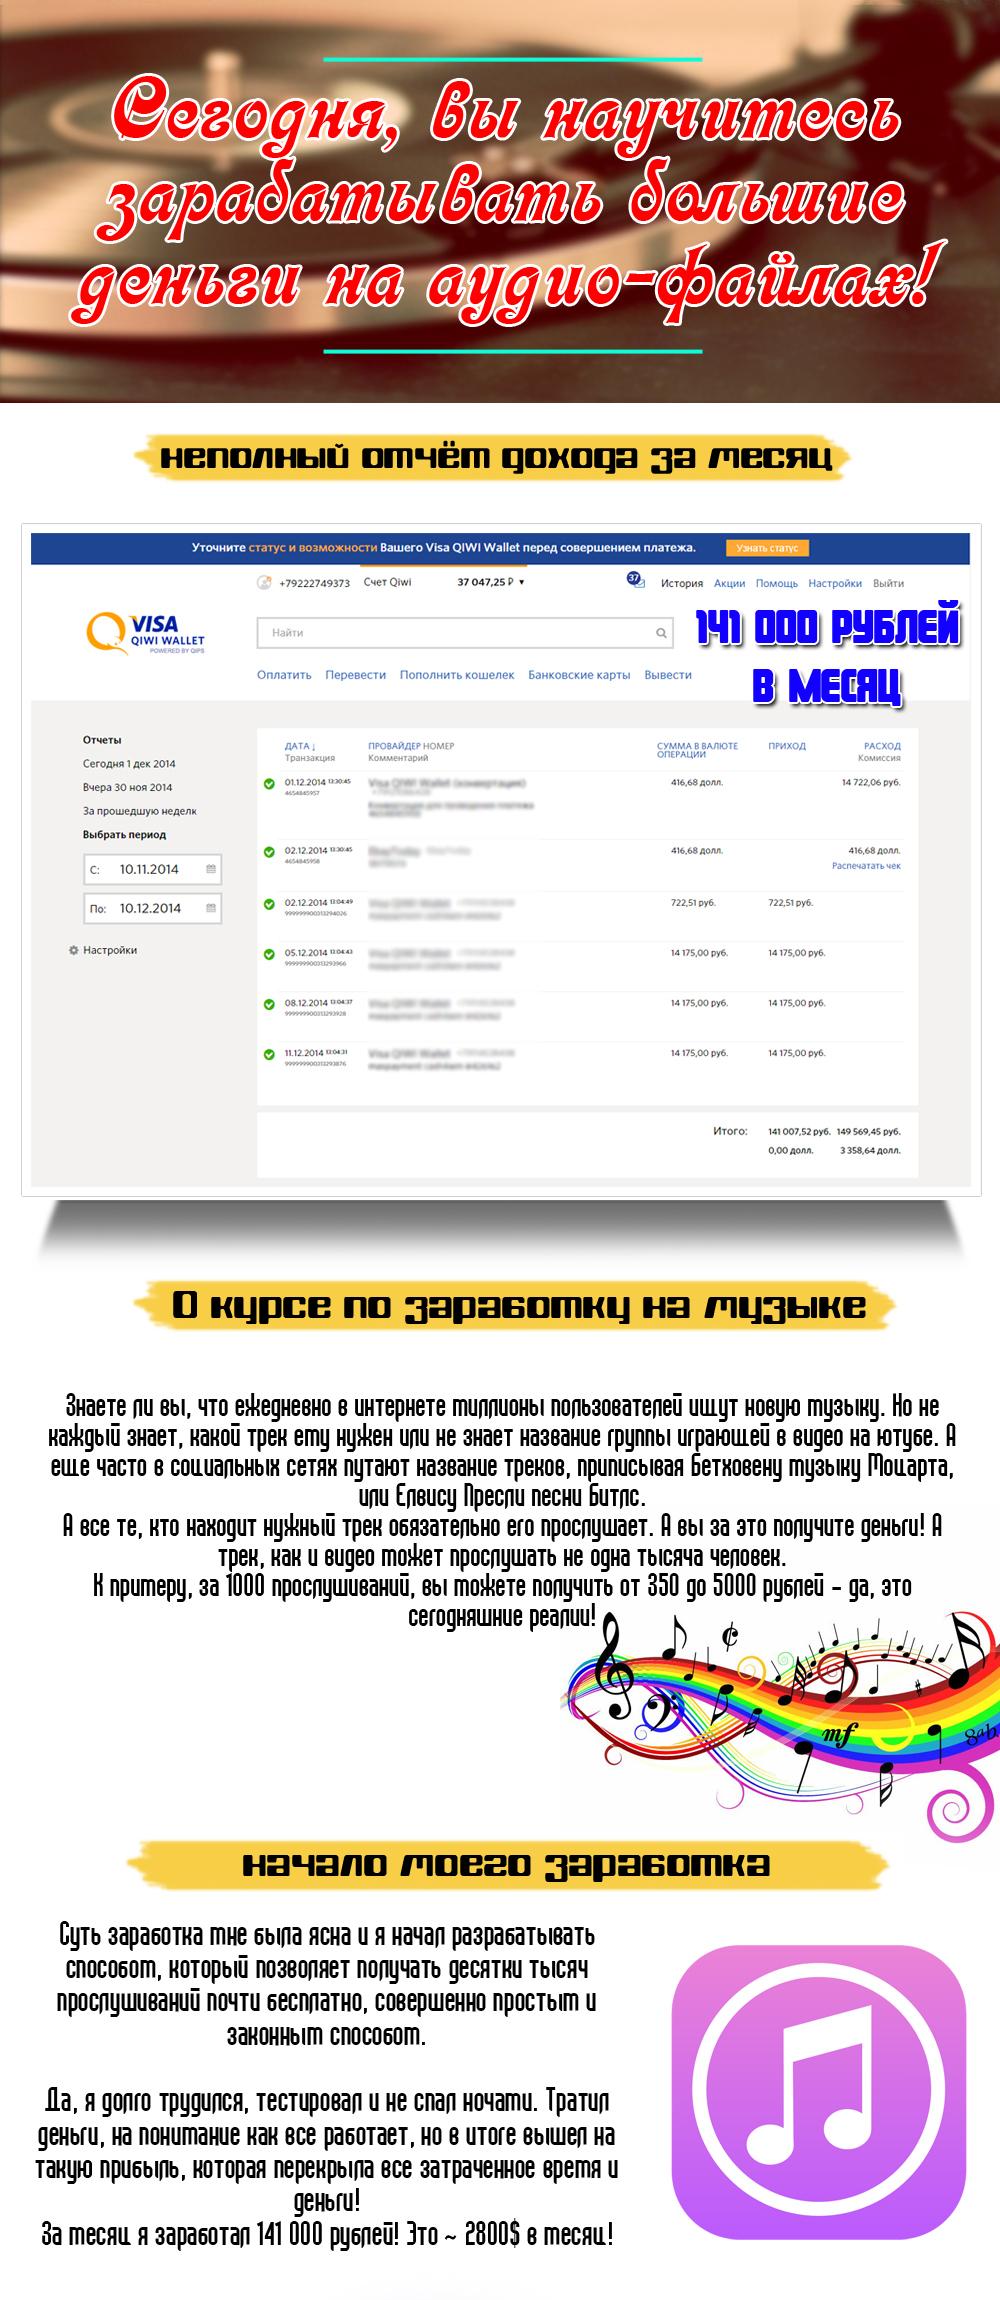 http://rabotaot100.ru.justclick.ru/media/content/rabotaot100.ru/2(2).jpg